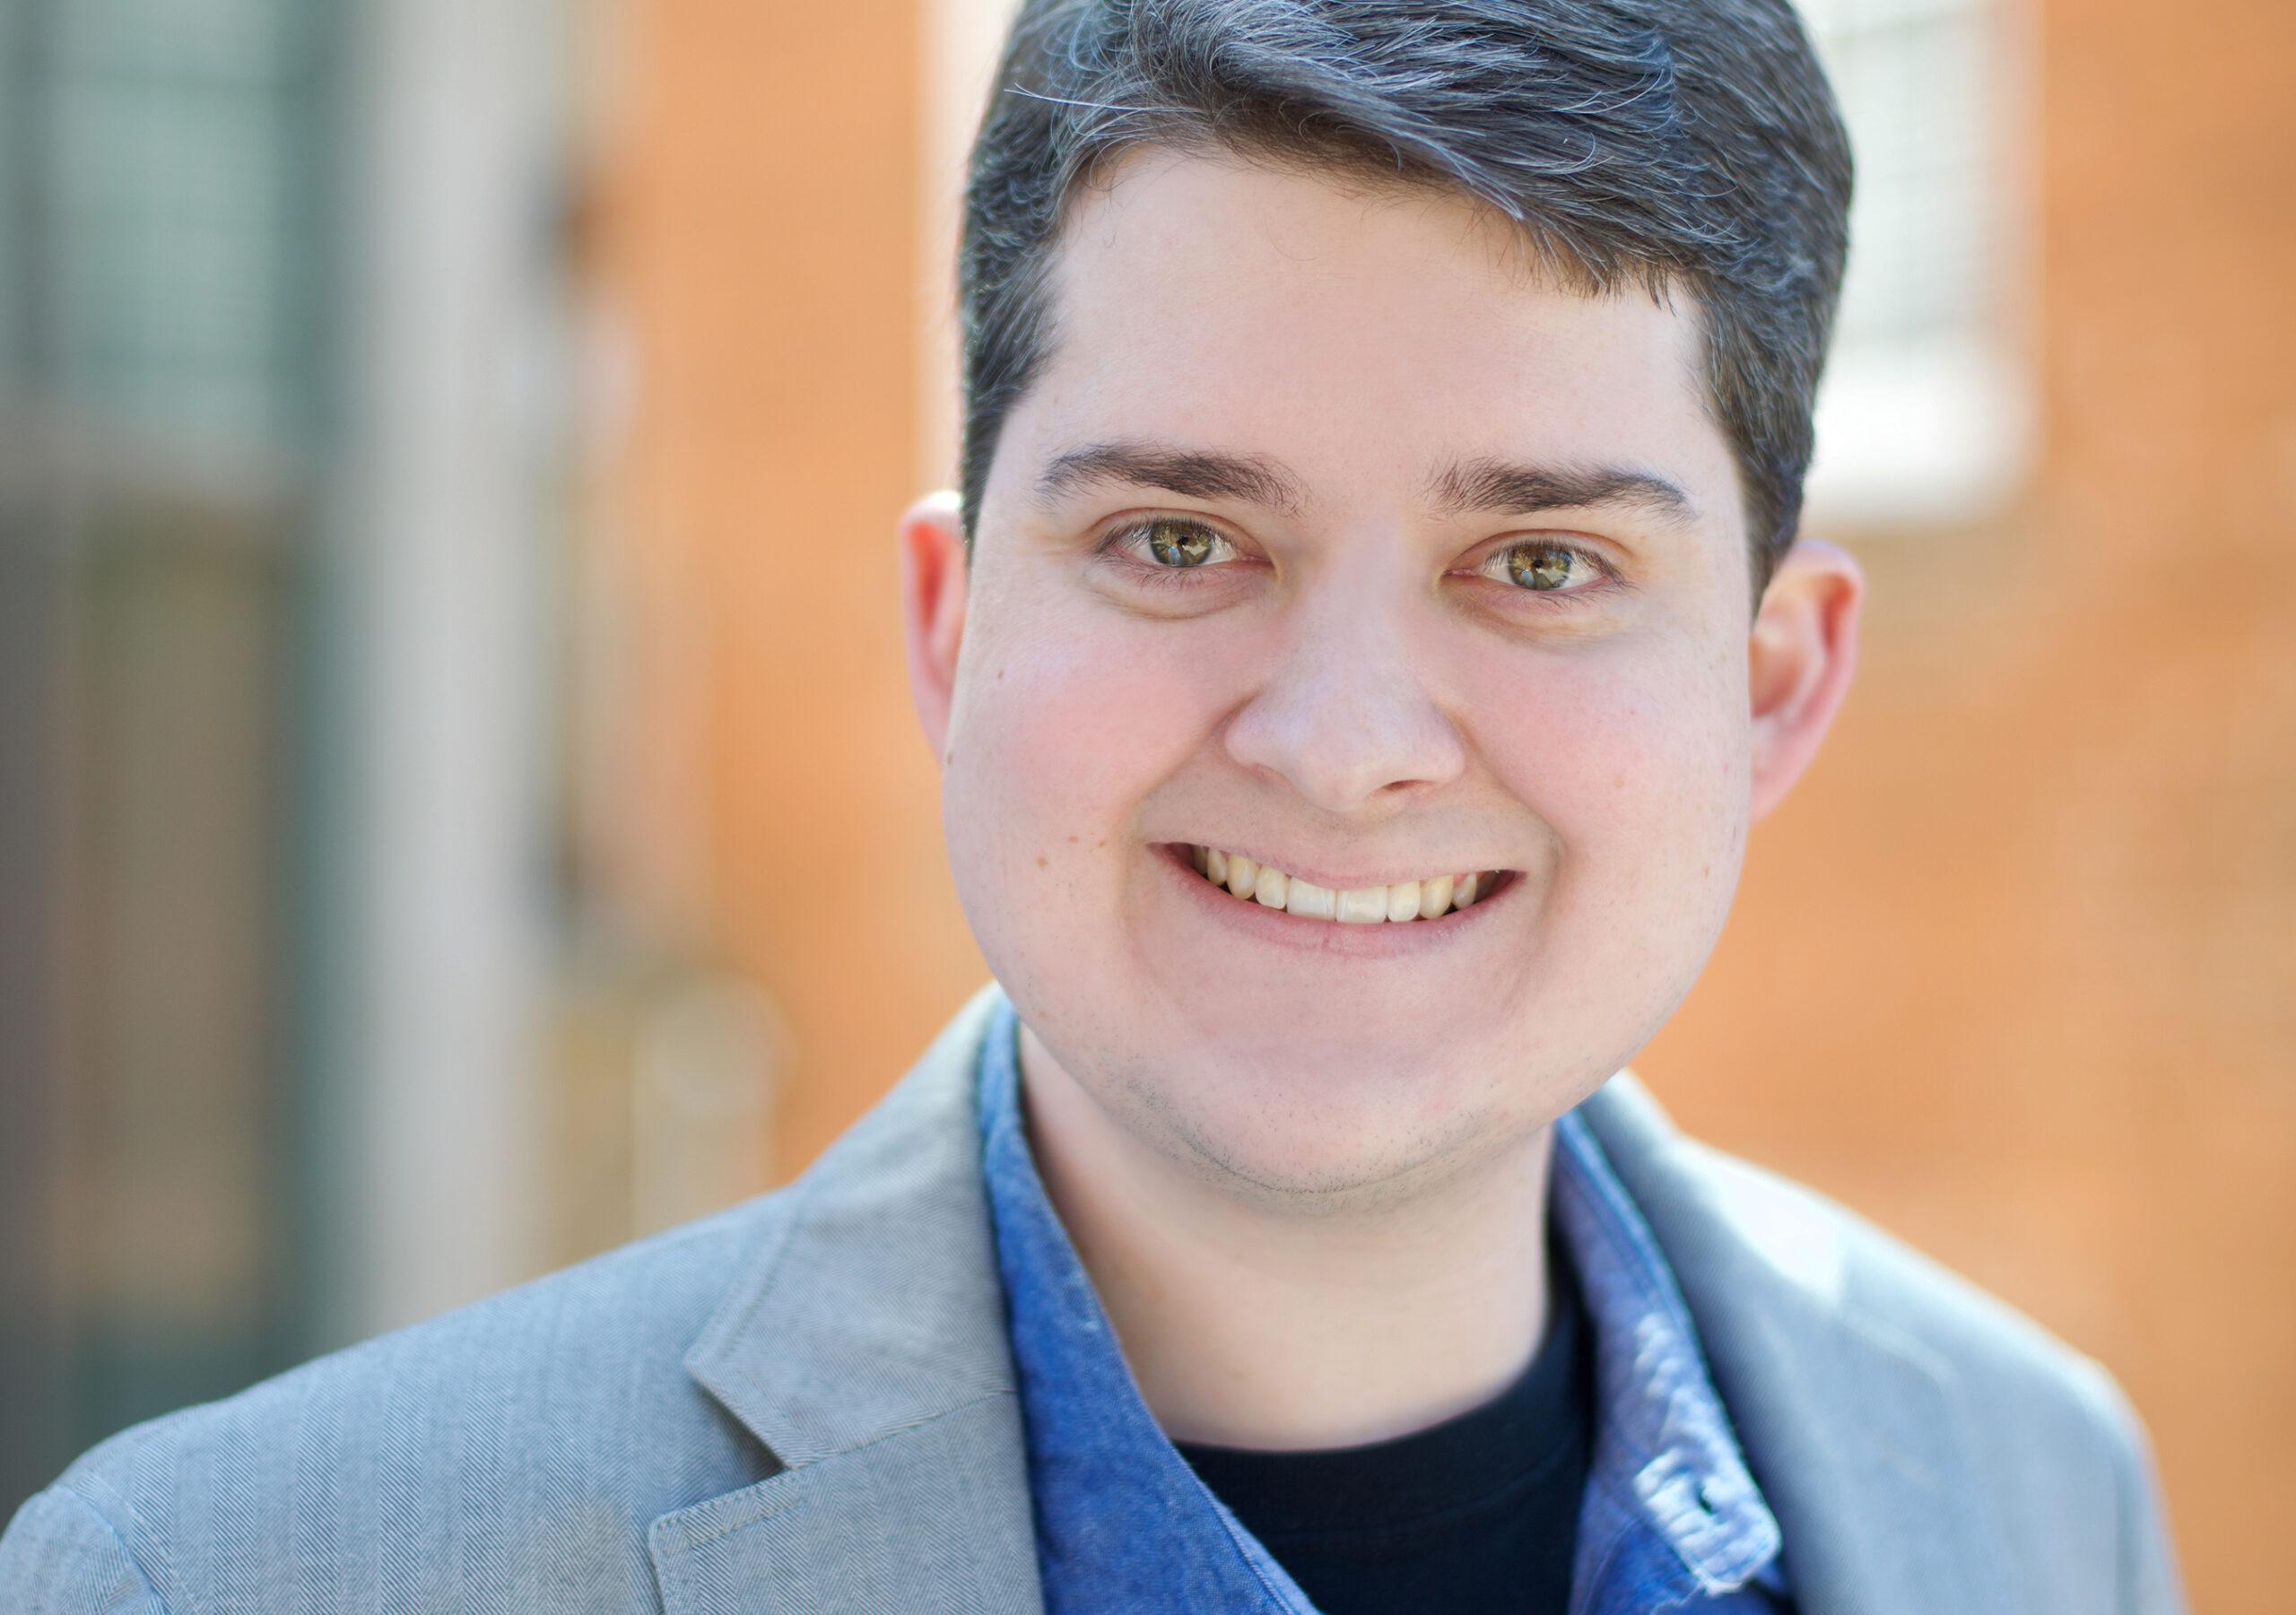 Interview with 'Laramie' Priest: Ryan Barry